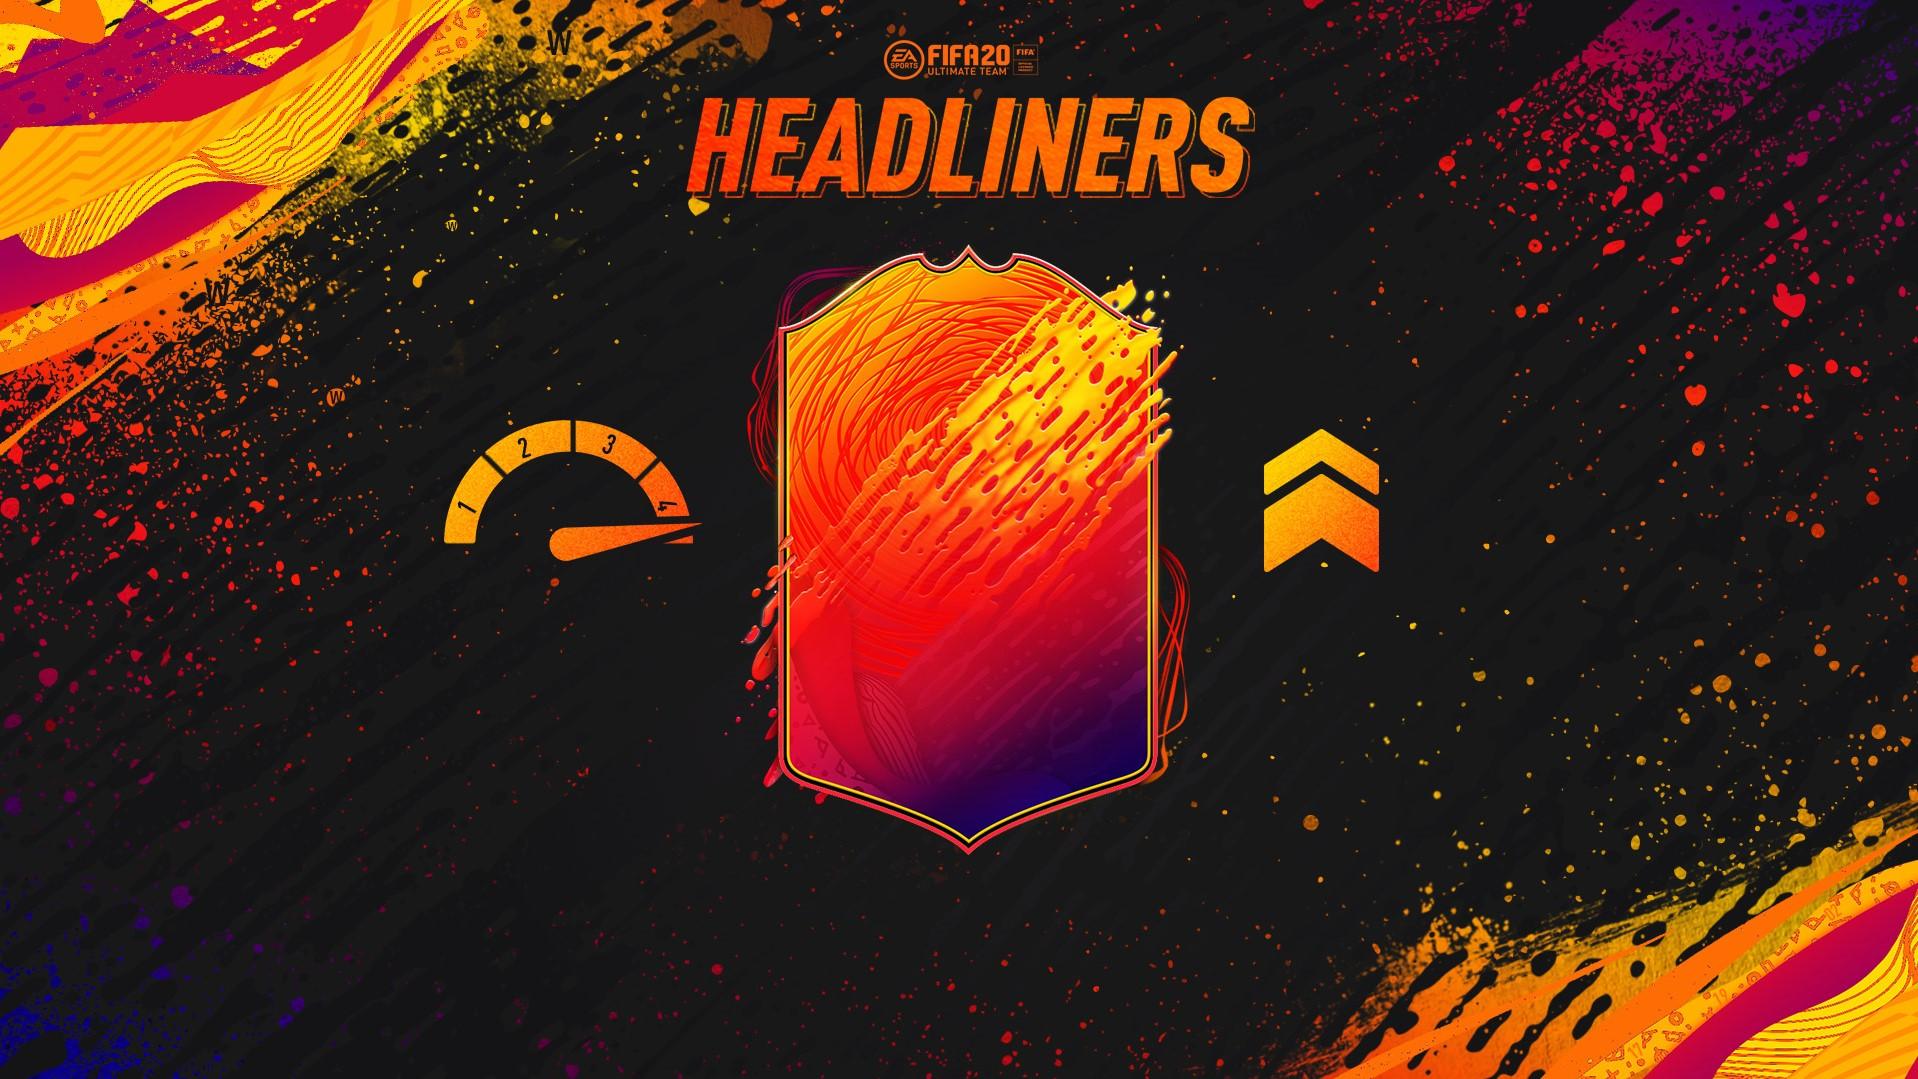 Headliners sur FIFA 20